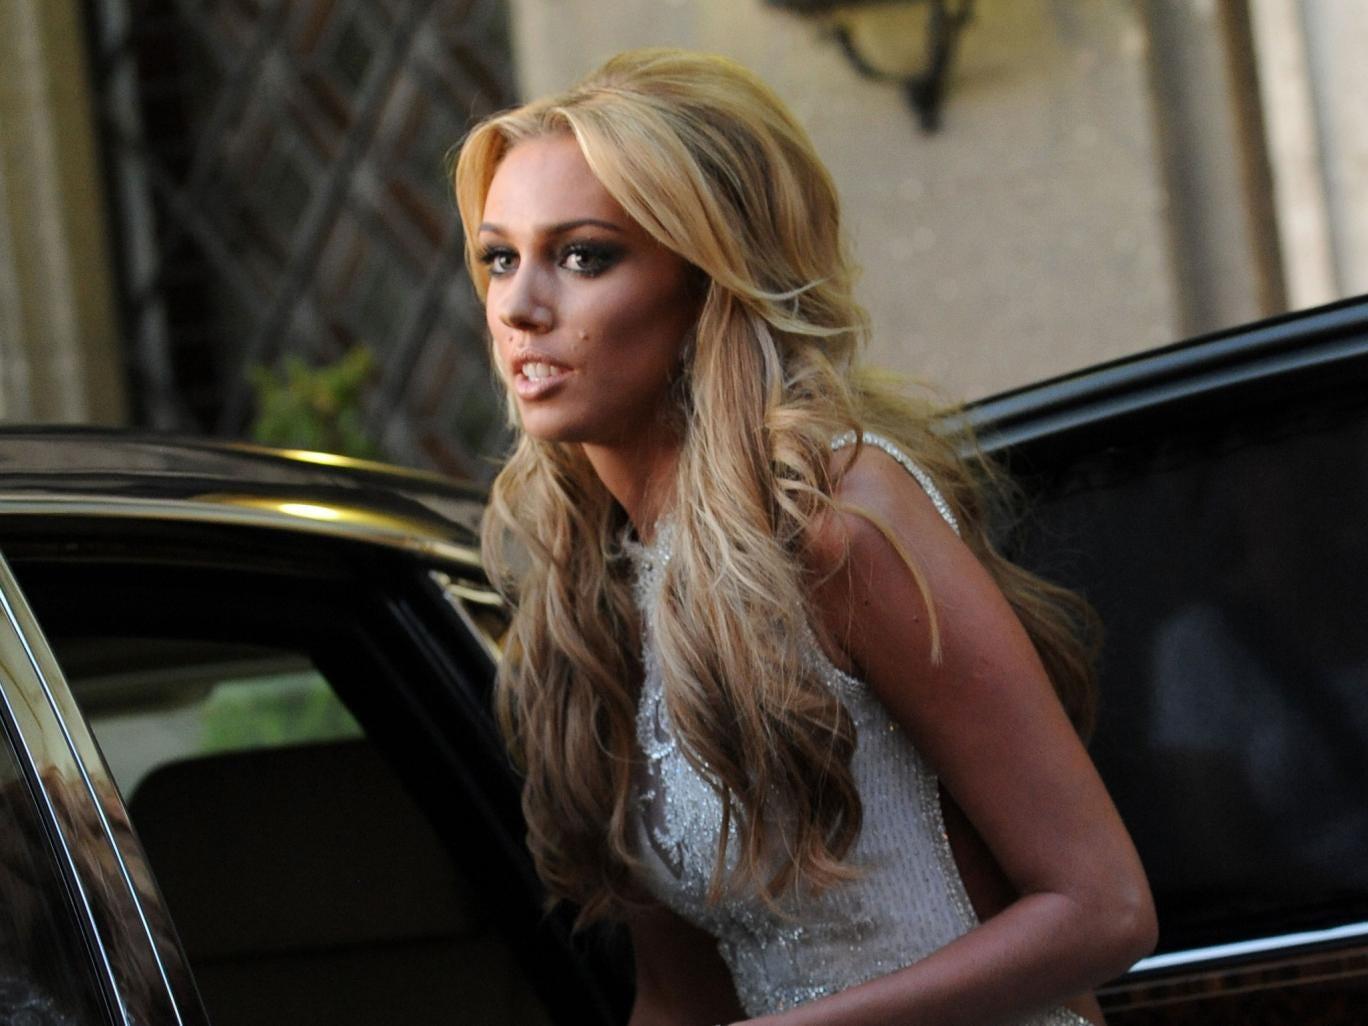 Petra Ecclestone had jewellery worth £450,000 stolen